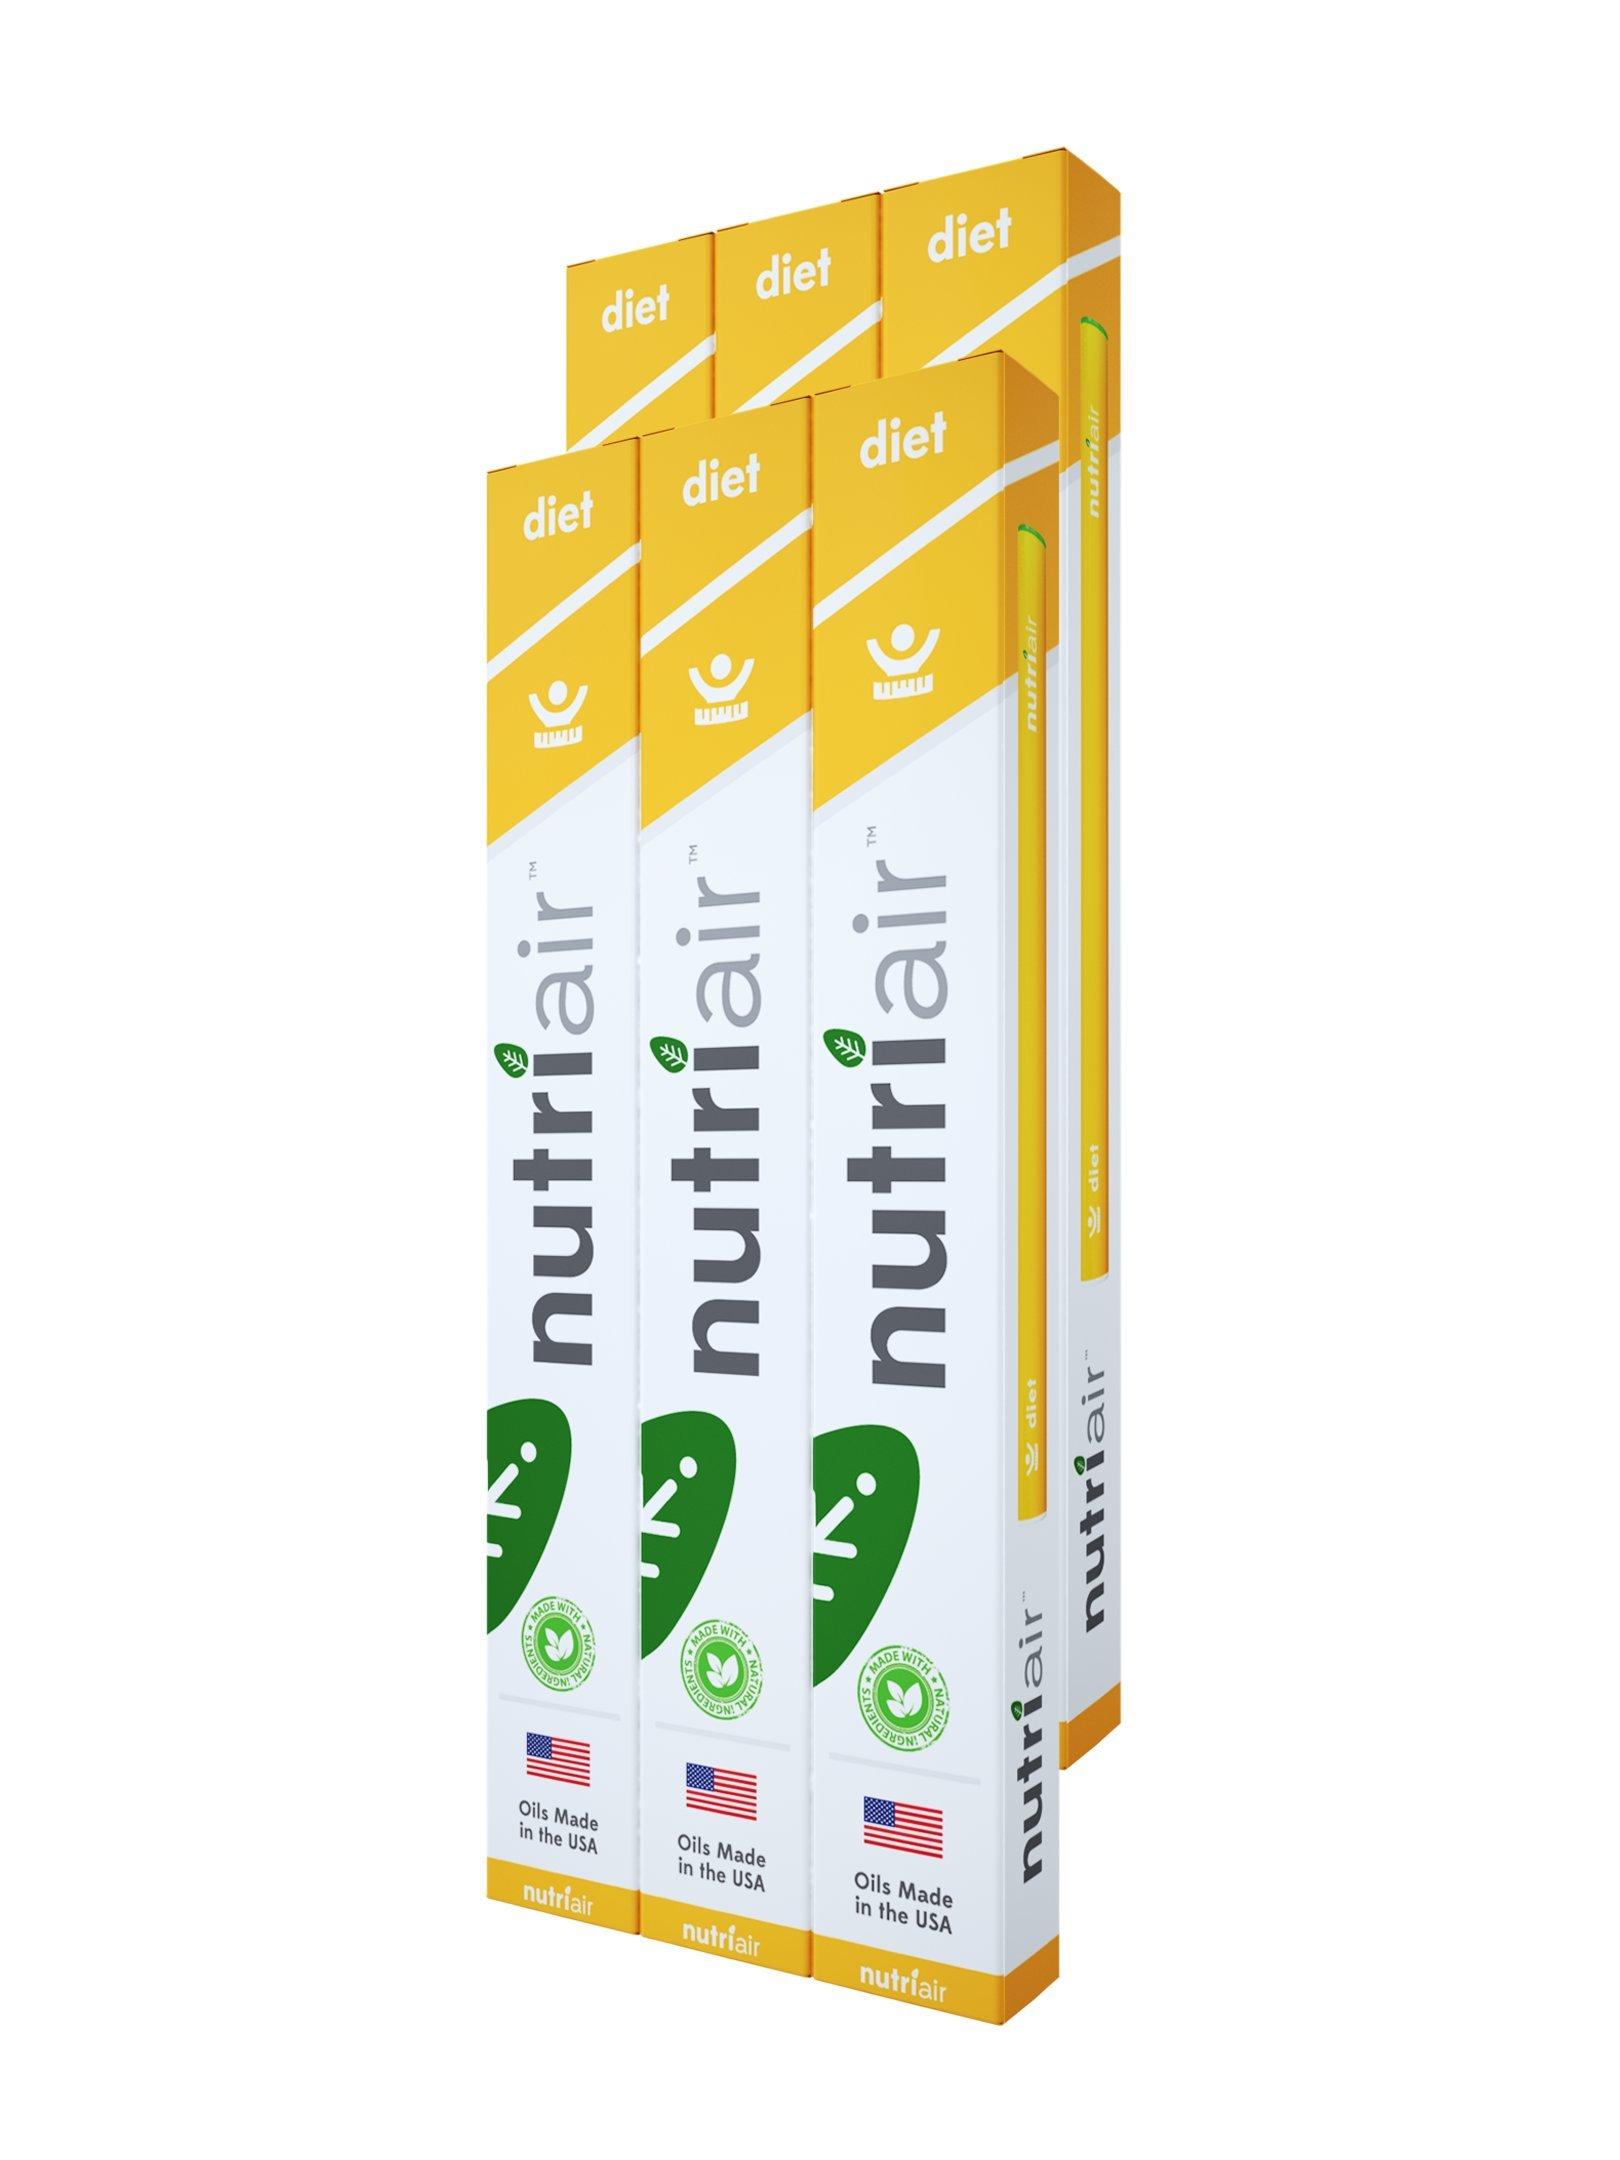 Nutriair Diet - Nutritional Supplement Inhaler - Instant Appetite Suppressant - Block Food Cravings - Control Calorie Intake (6) by Nutriair